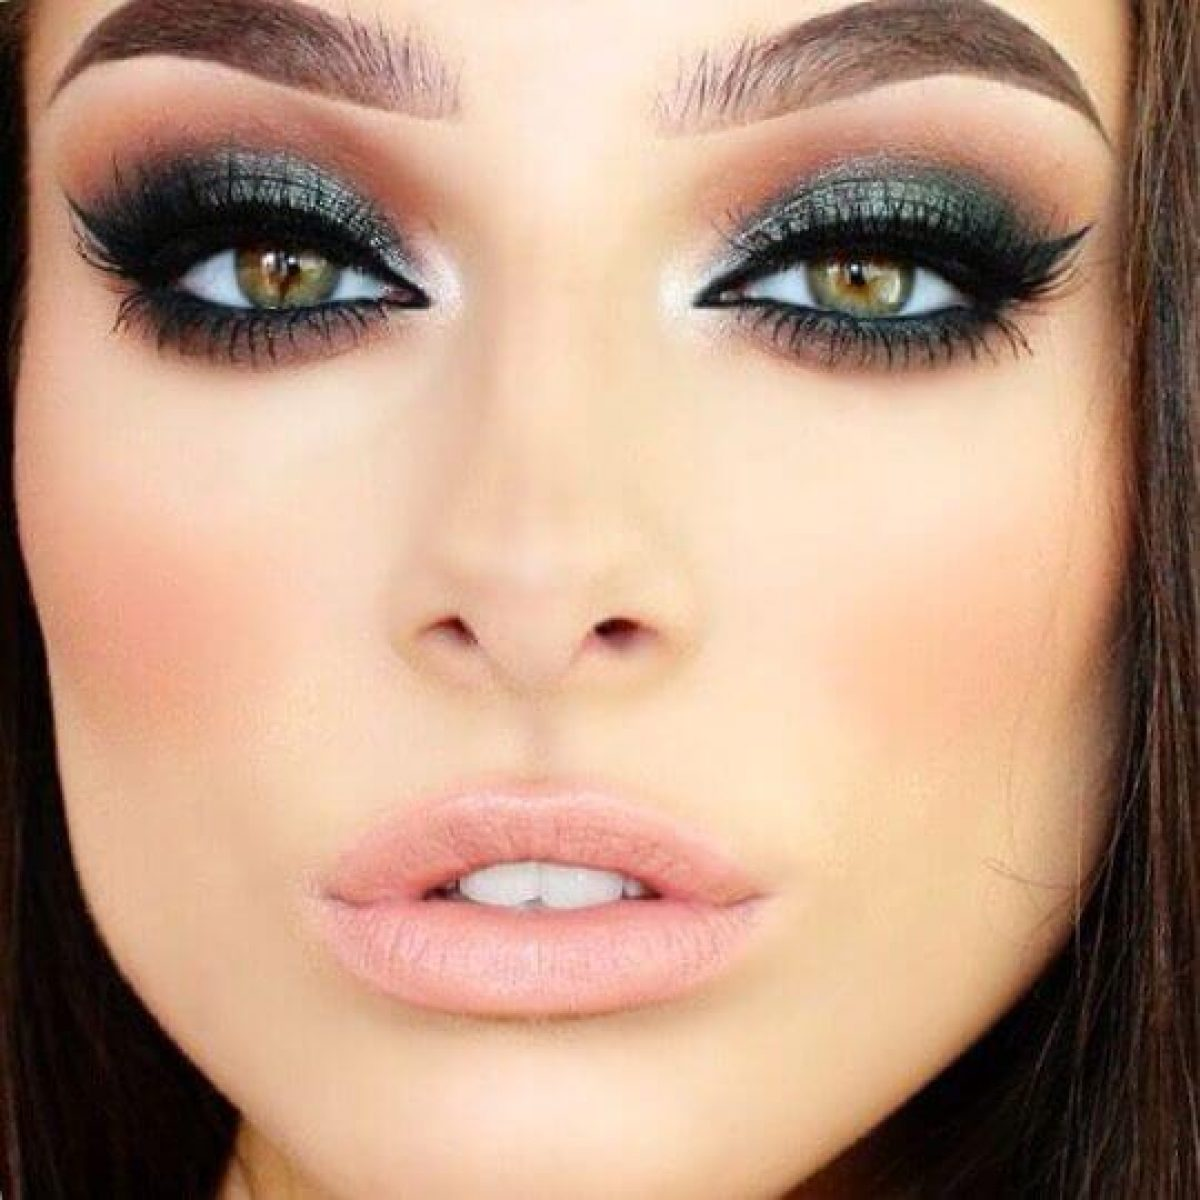 Green-black-smokey-eyes.-3 60+ Hottest Smokey Eye Makeup Looks in 2021